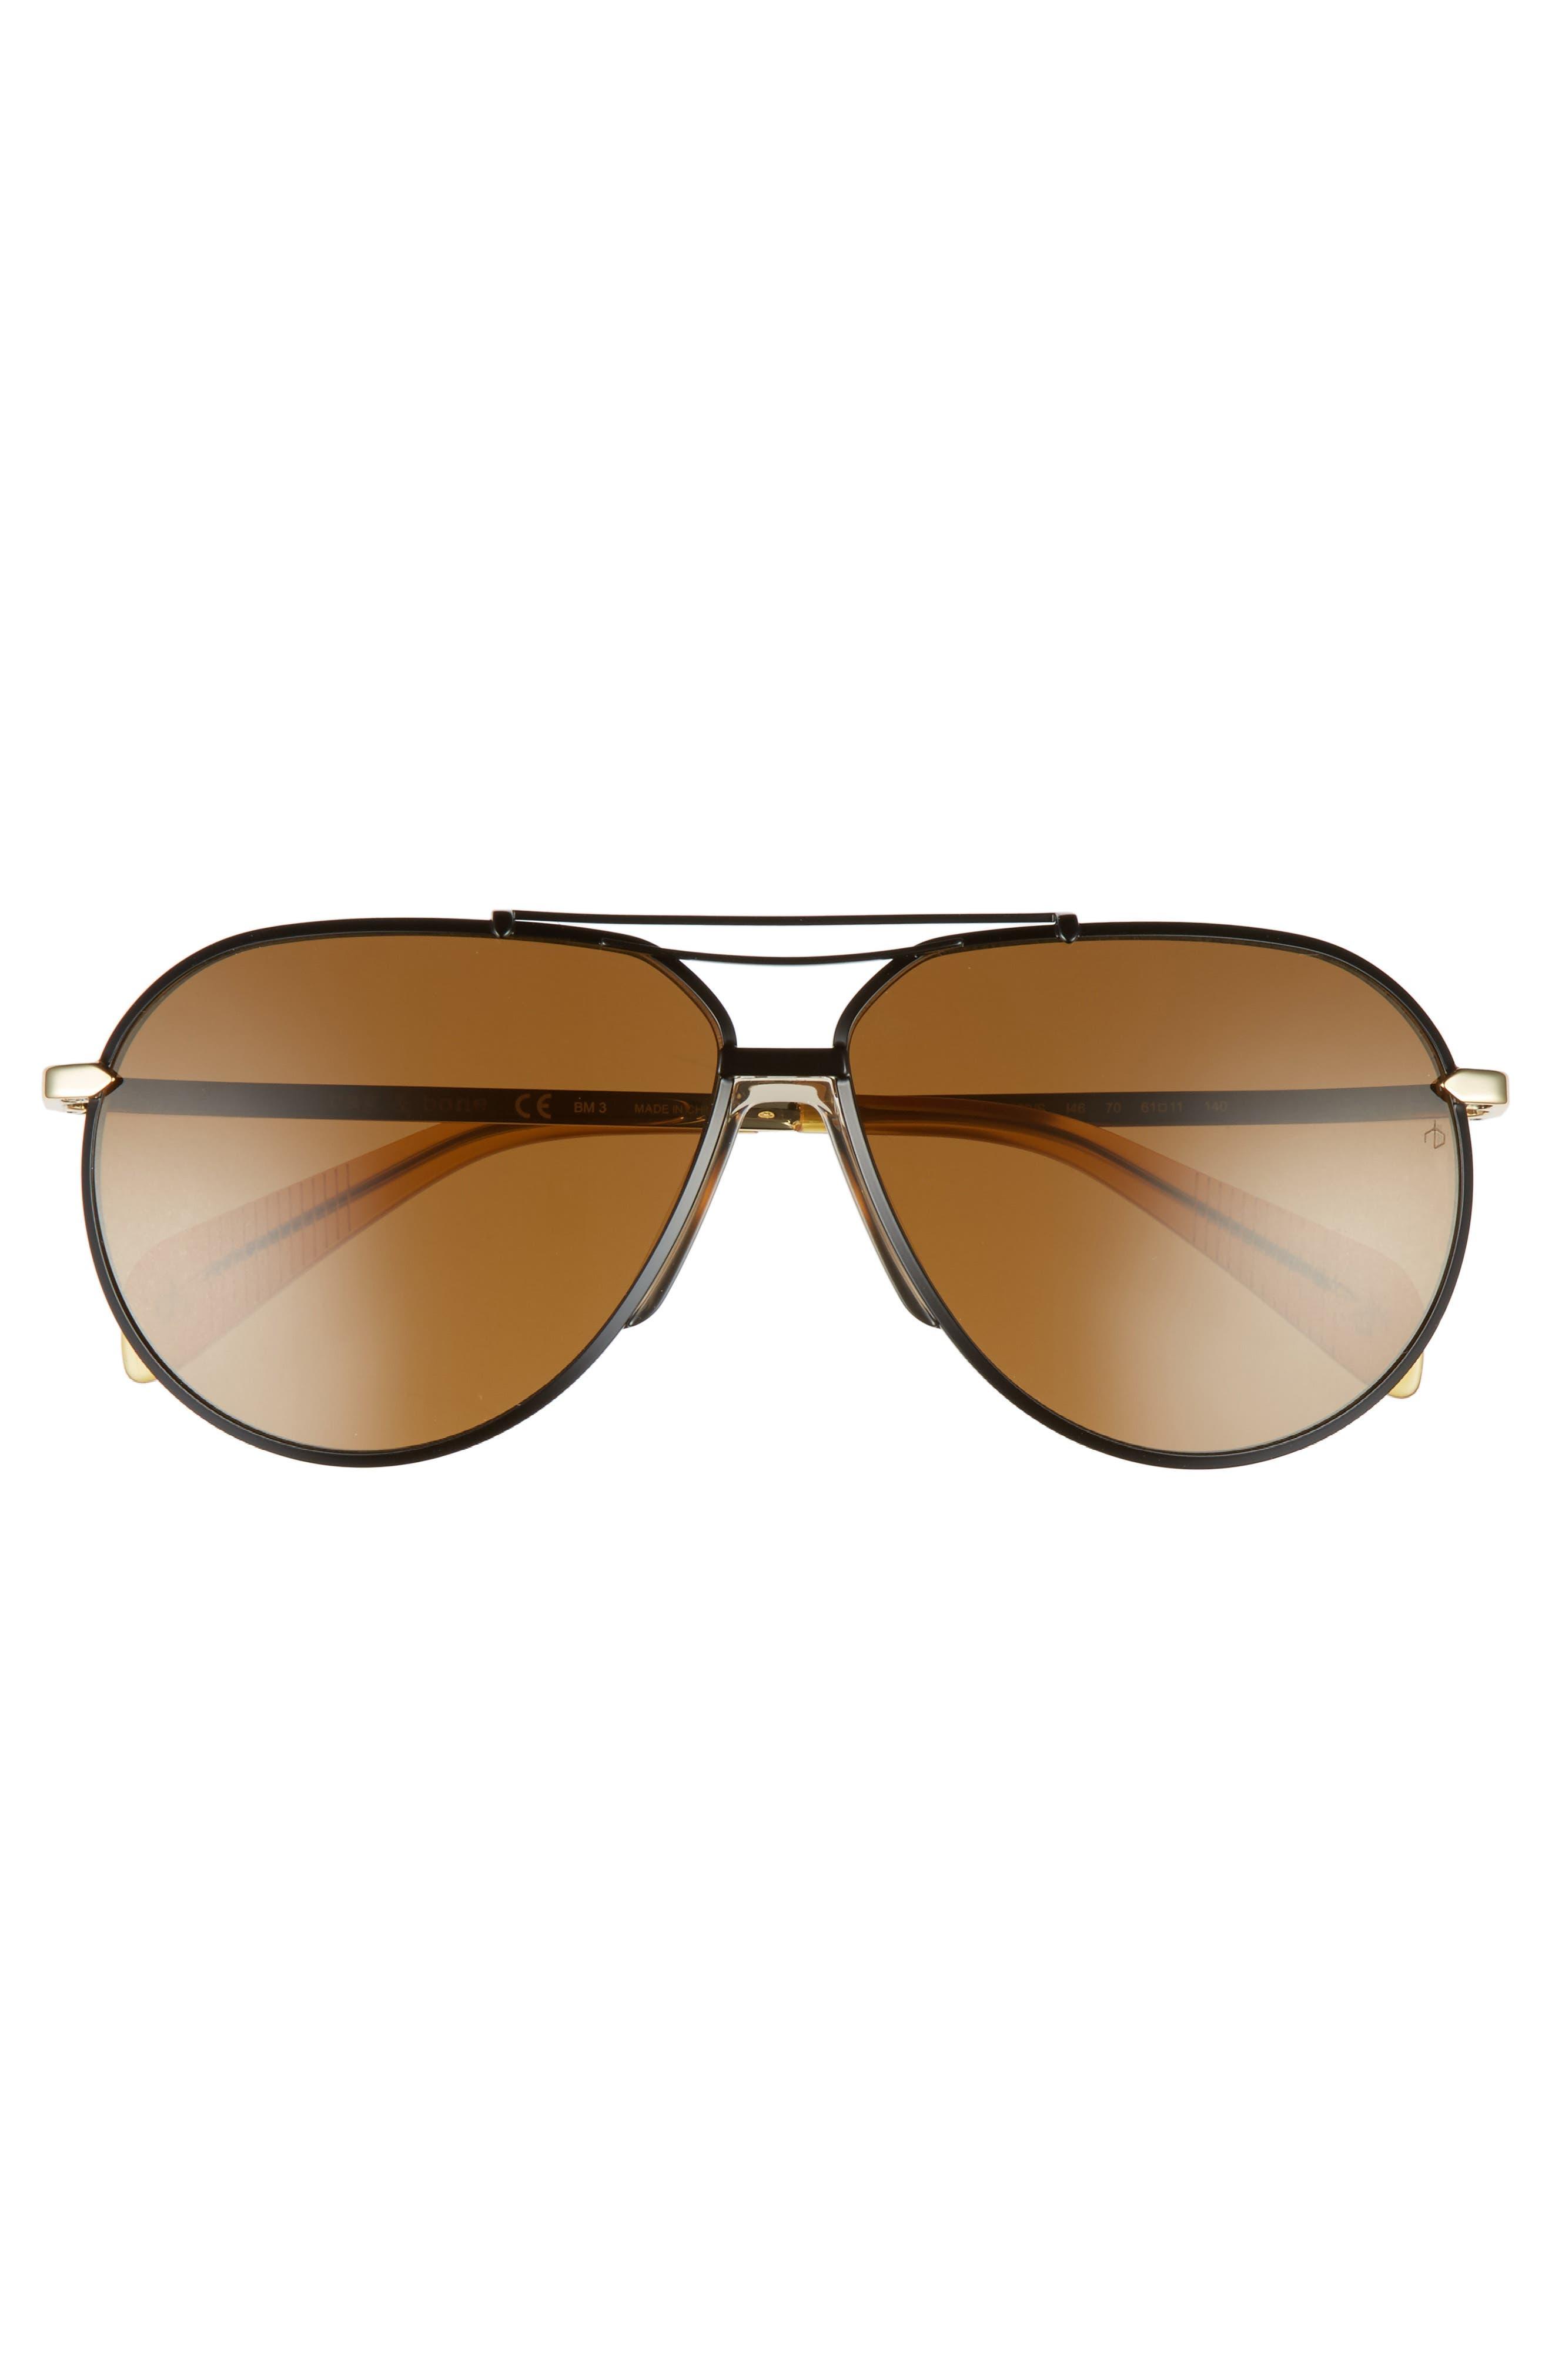 61mm Aviator Sunglasses,                             Alternate thumbnail 2, color,                             Black Gold